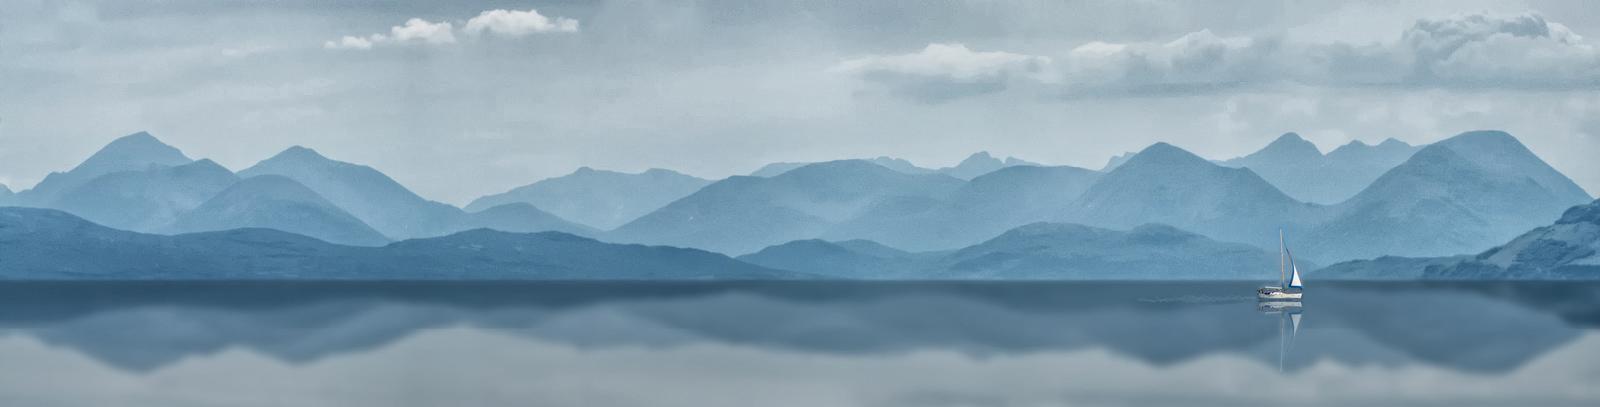 Russell McGowan_Over the Sea to Skye_Bro